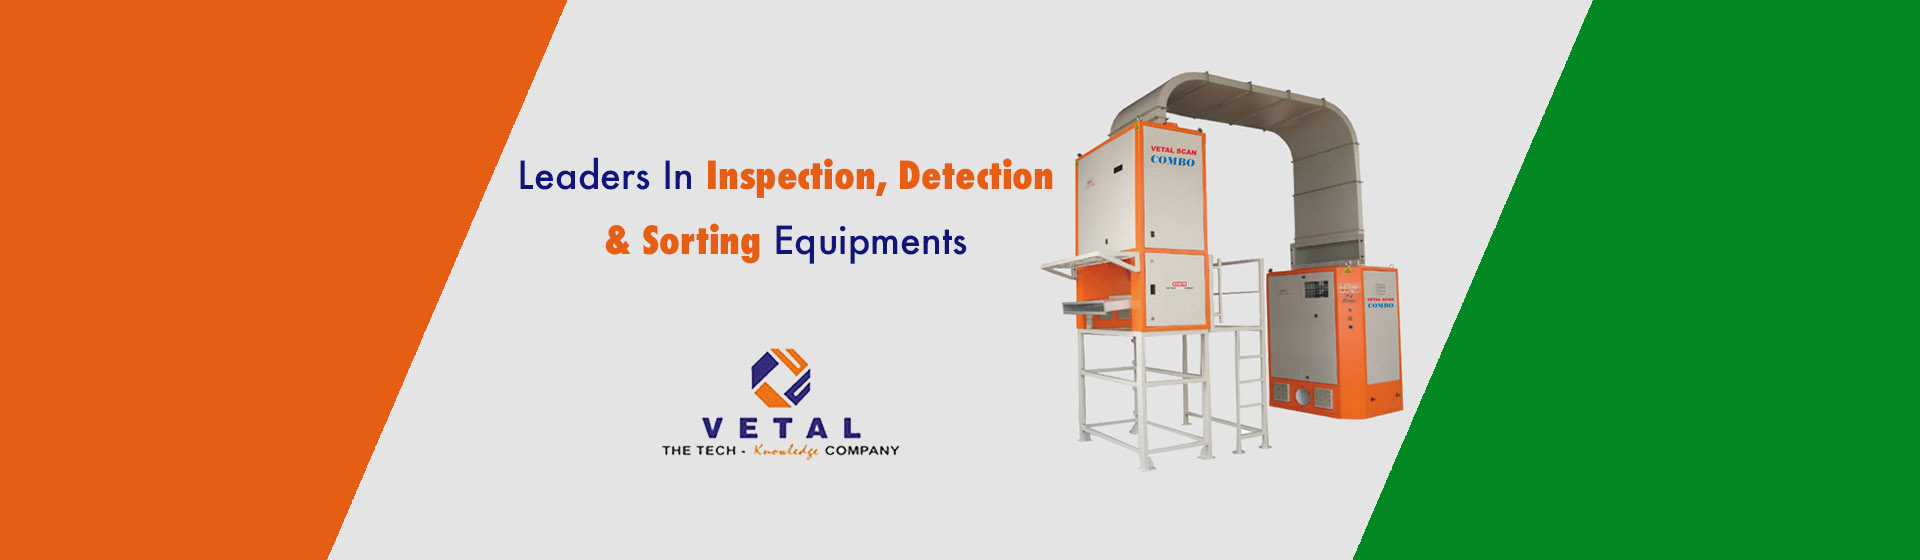 cotton contamination cleaner vetal electronics